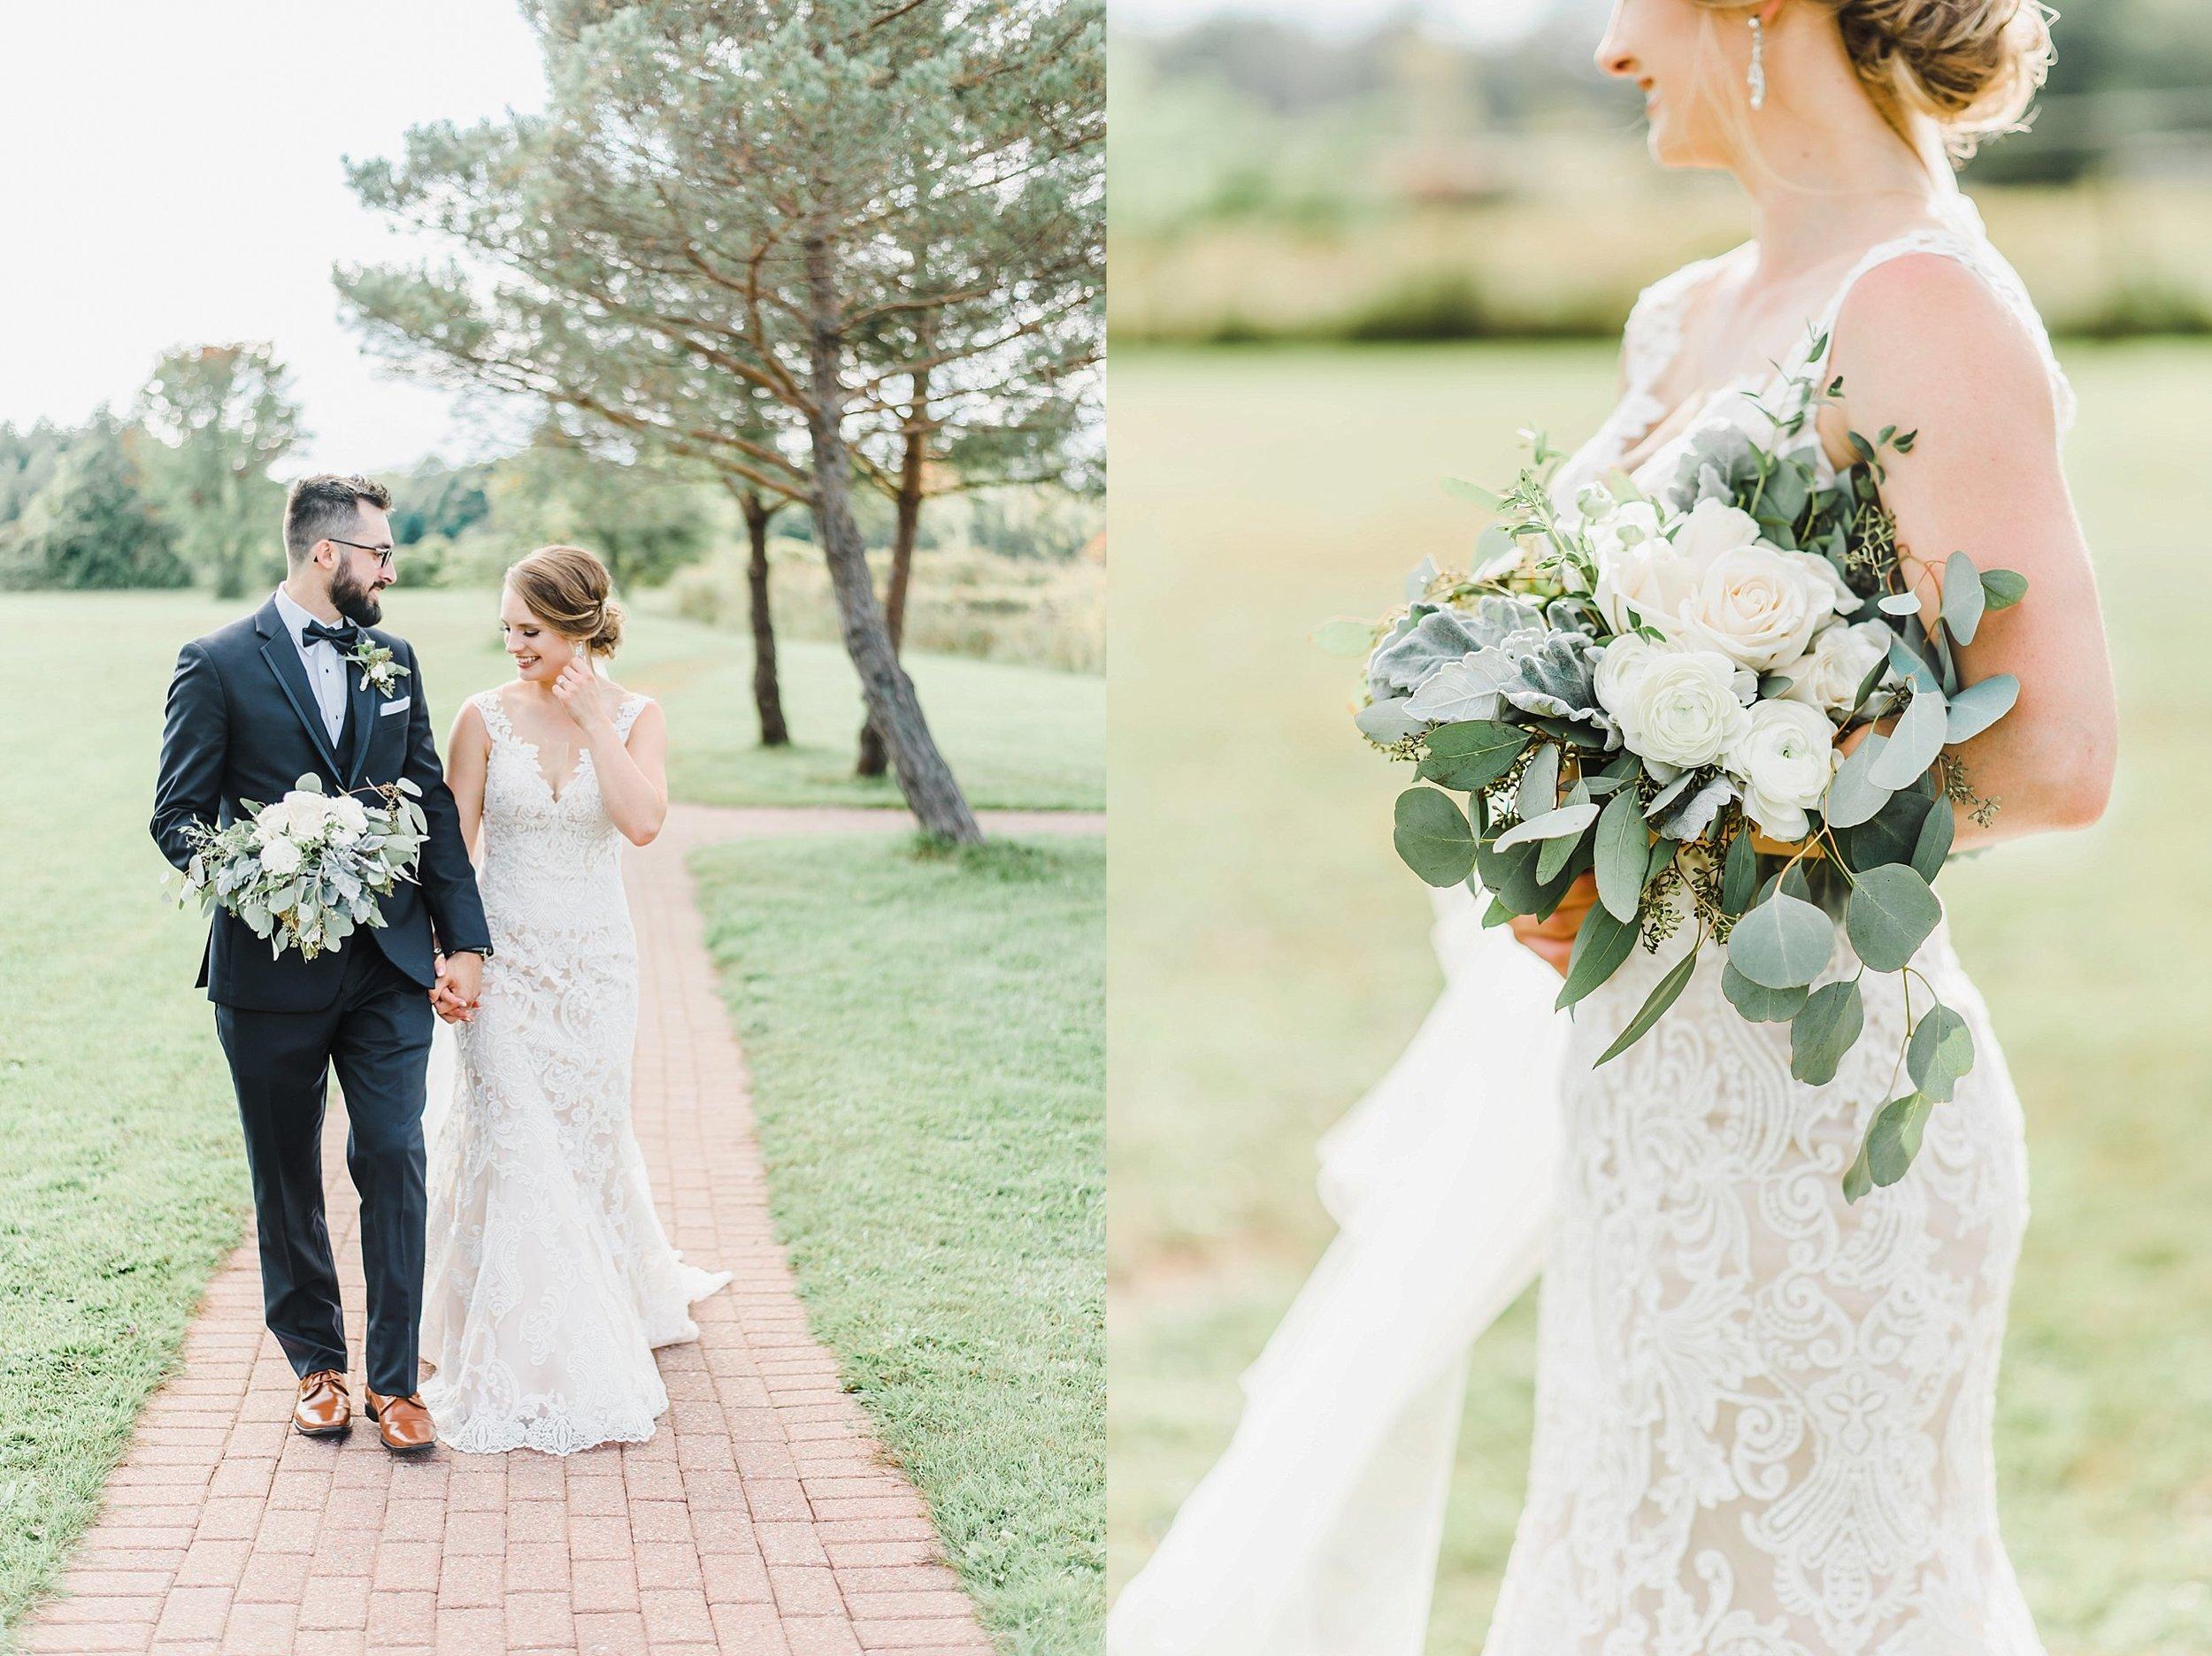 light airy indie fine art ottawa wedding photographer | Ali and Batoul Photography_1316.jpg